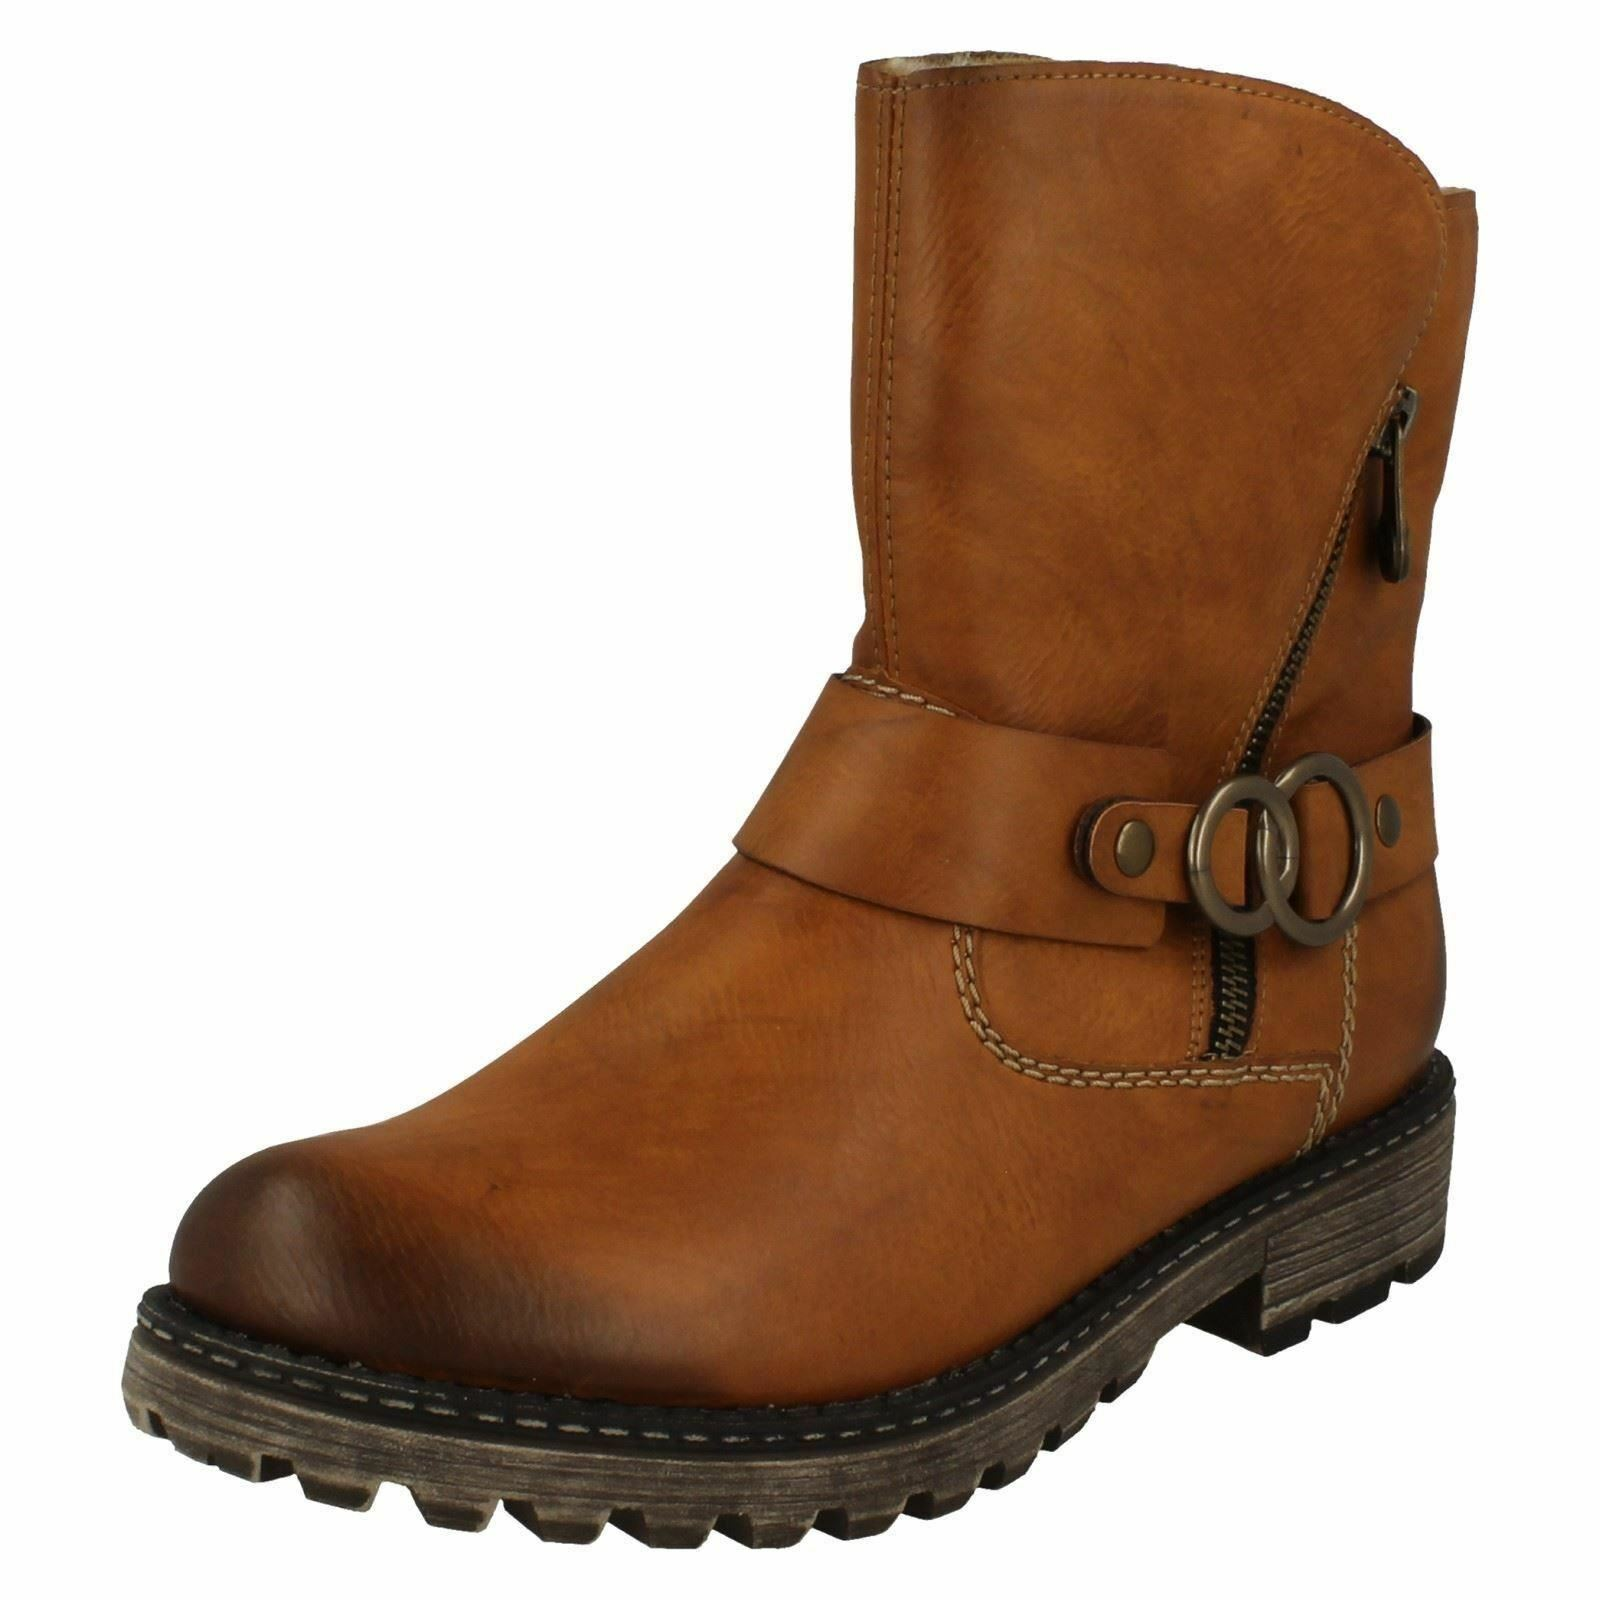 802 67a599 Gabor Señora Negro negro mel 47 72 Botas Zapatos qwYq6U